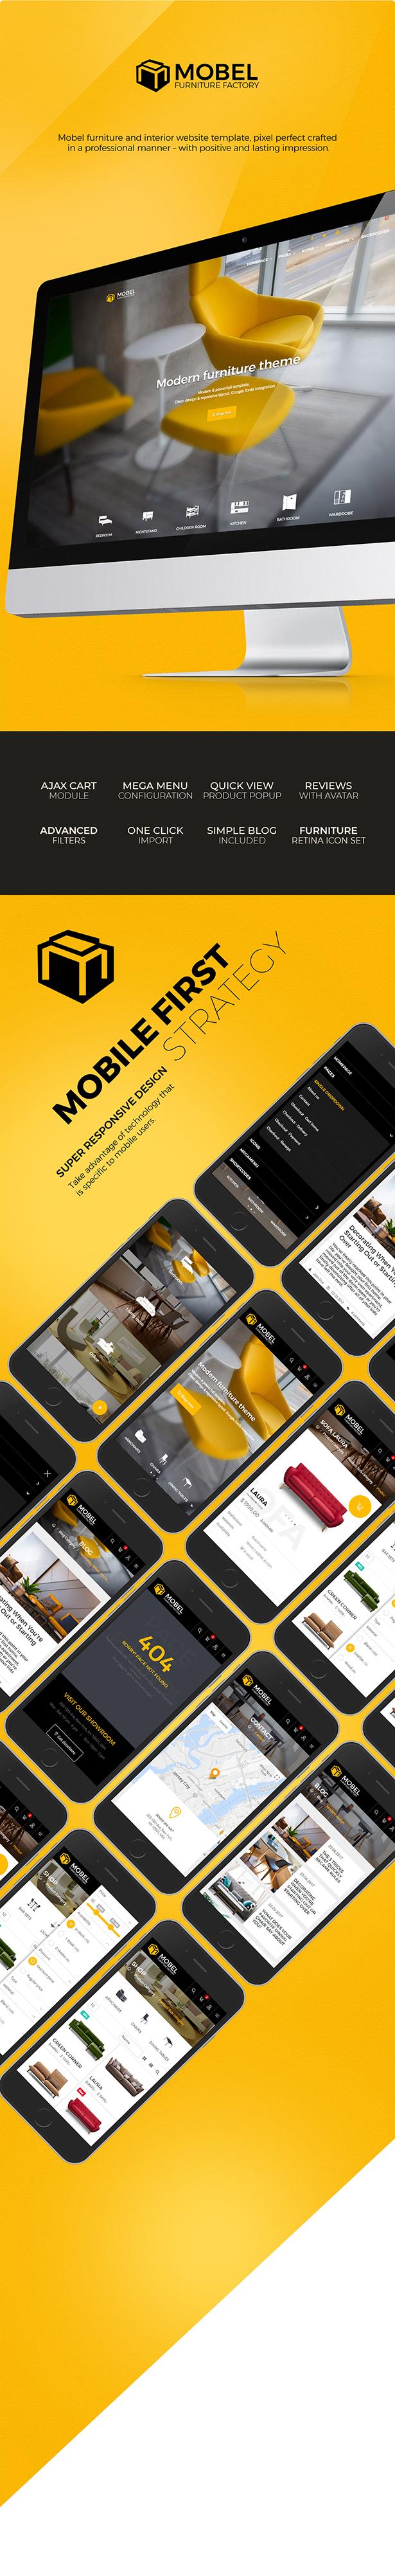 Mobel - Furniture OpenCart Theme - 4